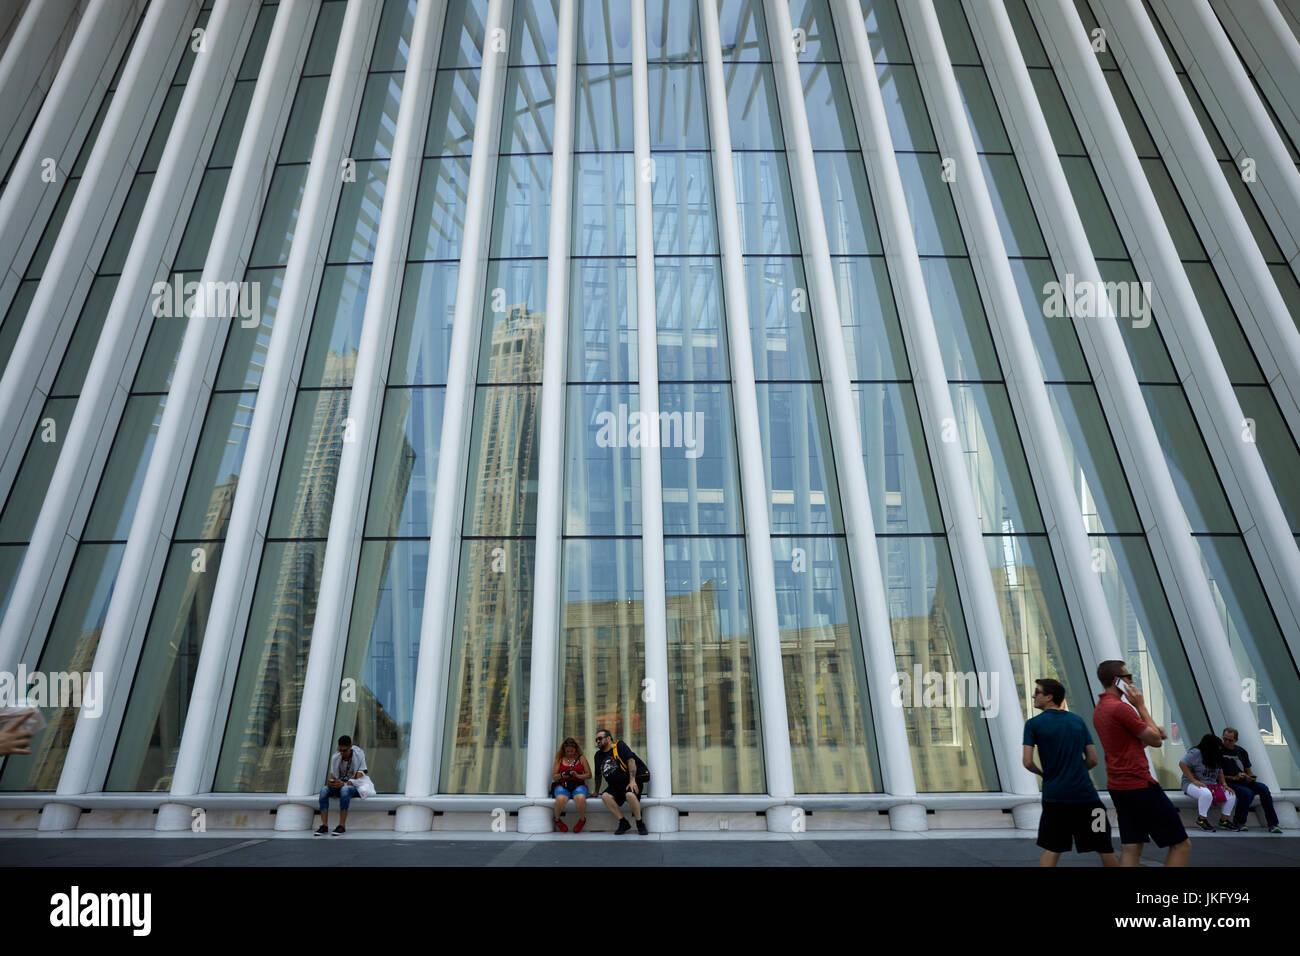 New York City, Manhattan, United States Westfield World Trade Center shopping center  World Trade Center complex - Stock Image